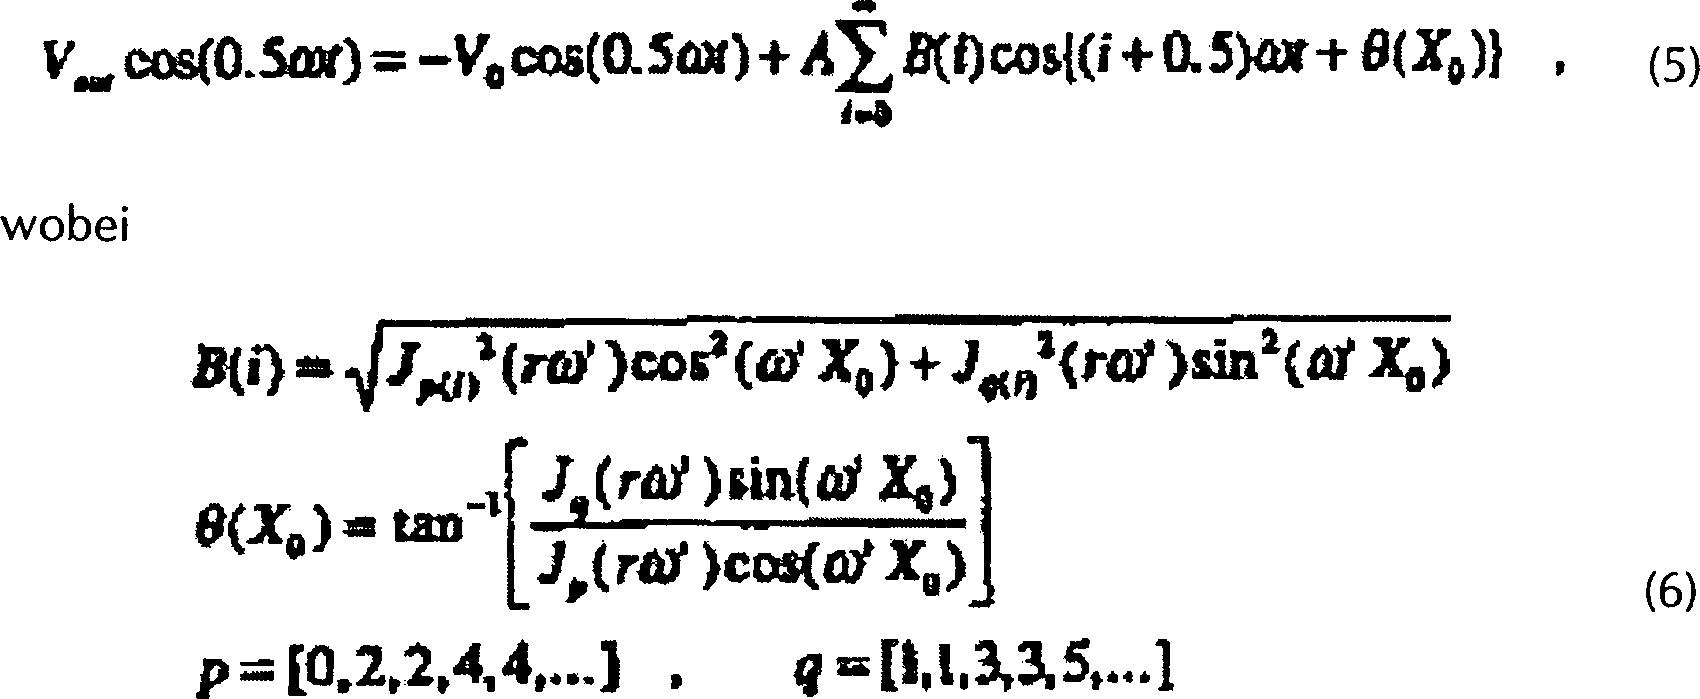 DE69736457T2 - Interatomare Messtechnik - Google Patents